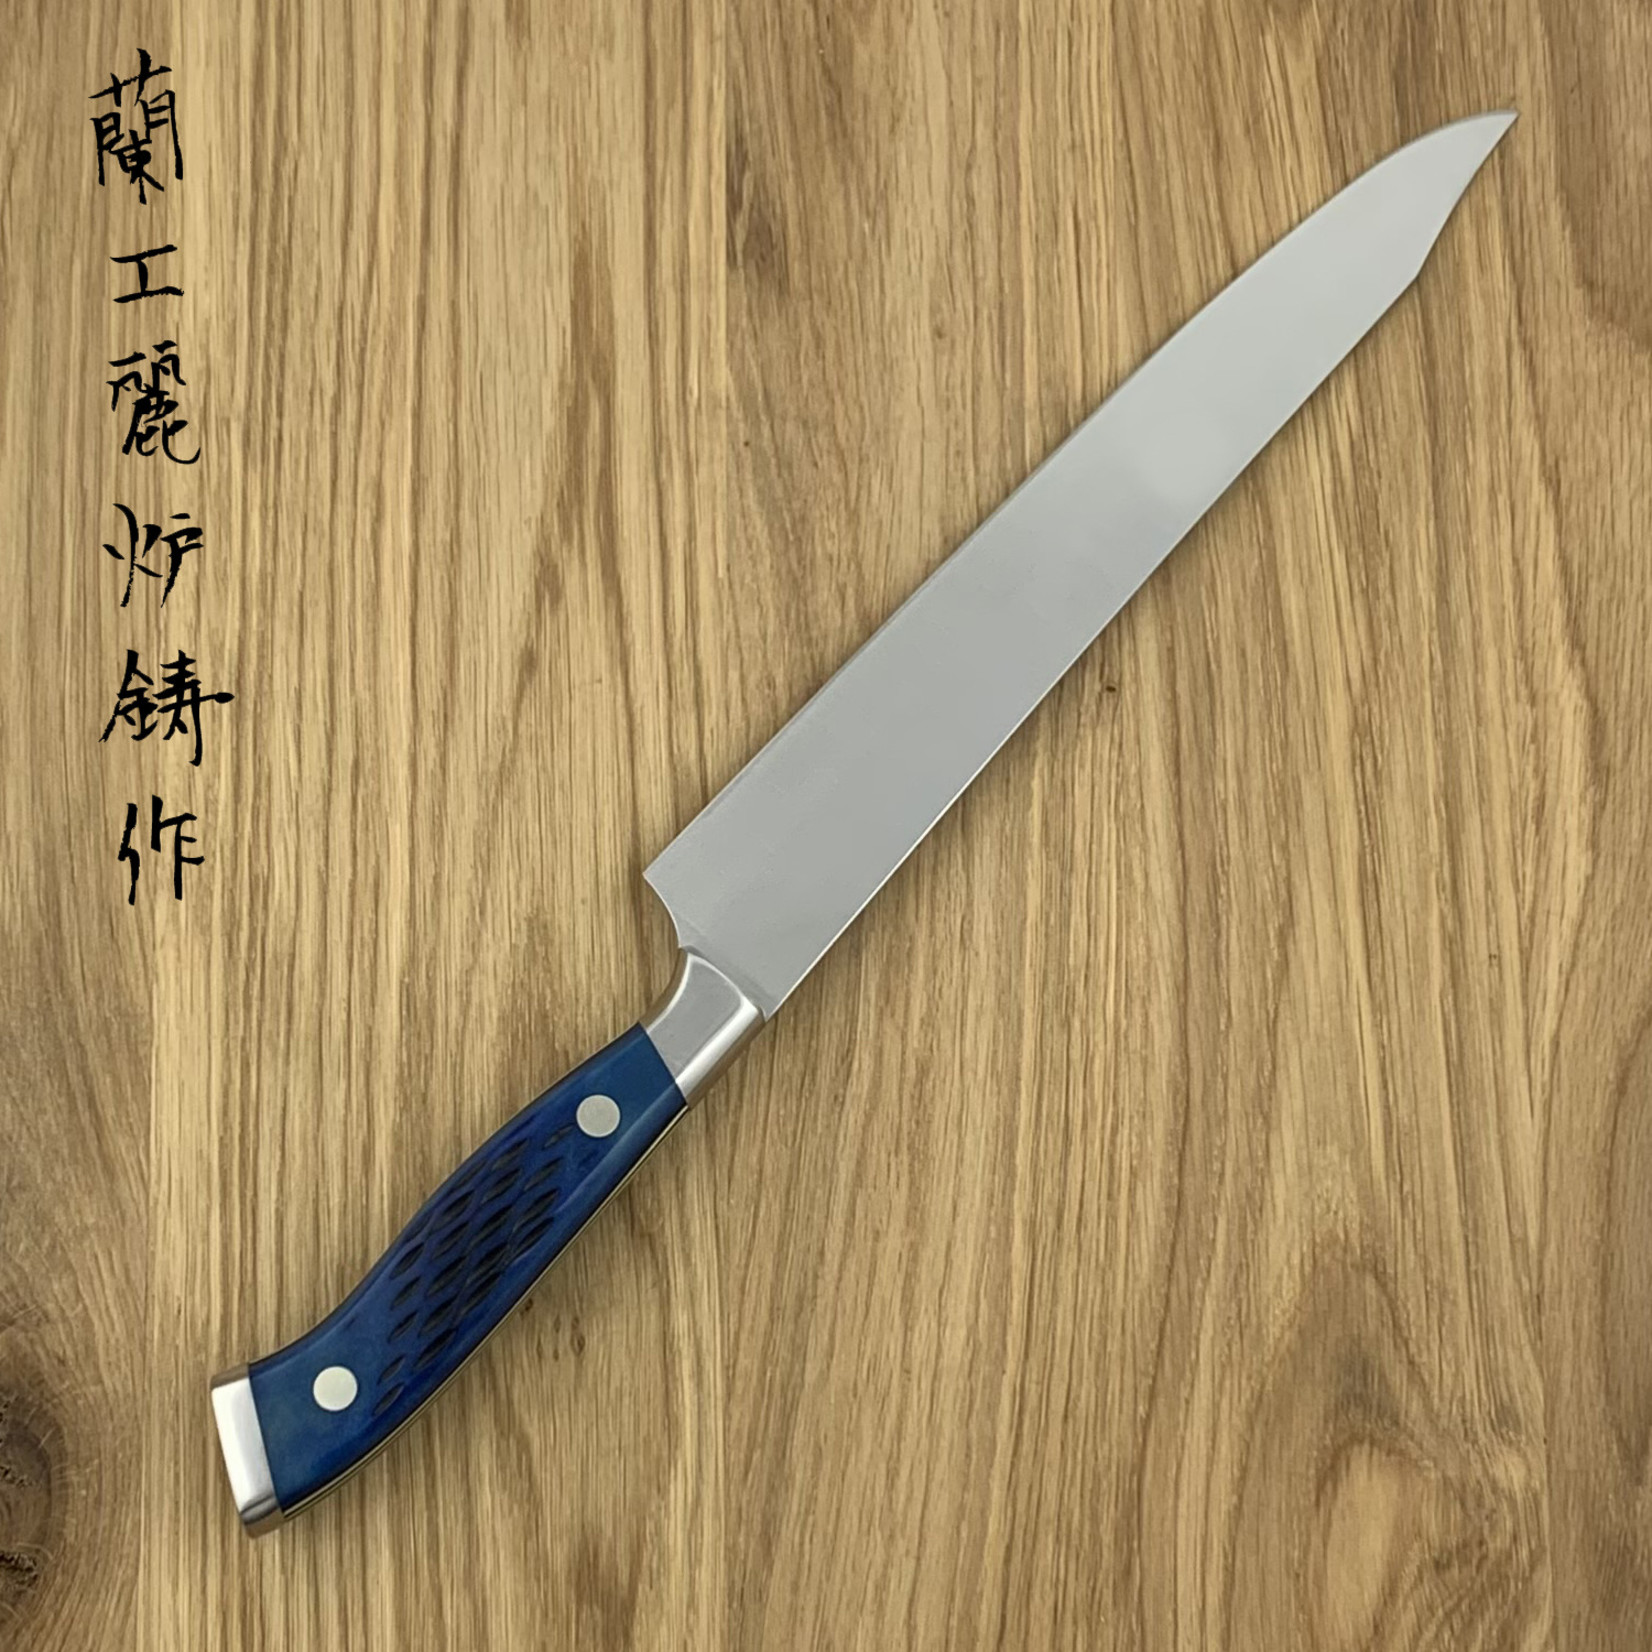 NENOHI NENOX Premium blue sujihiki 210 mm